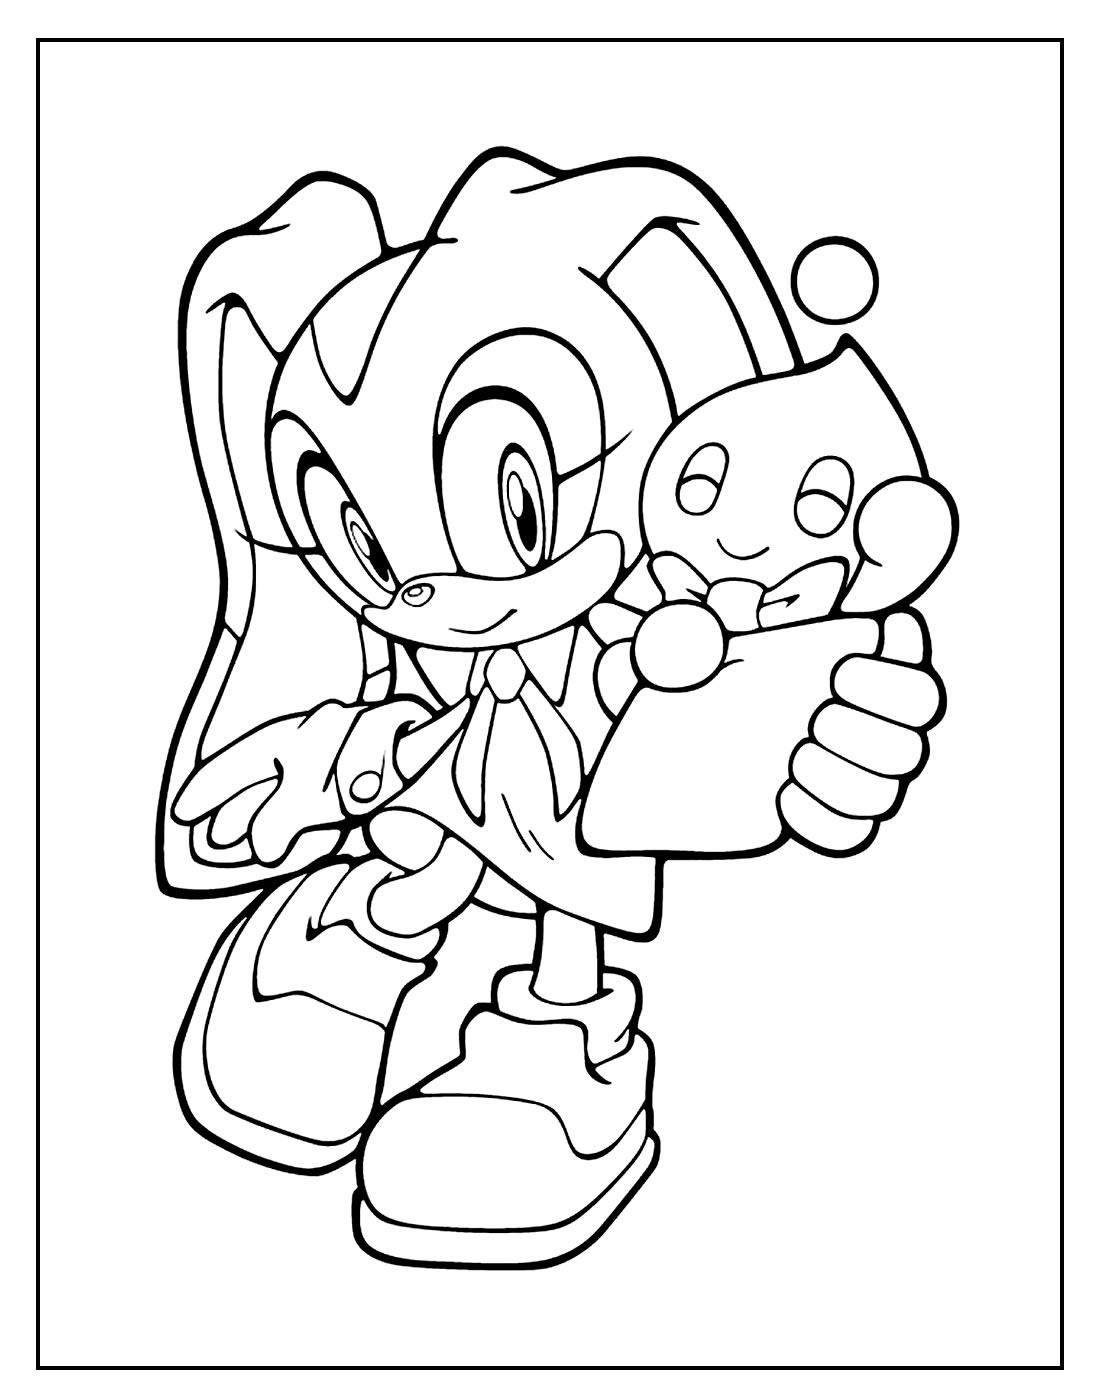 Desenho para colorir de Sonic